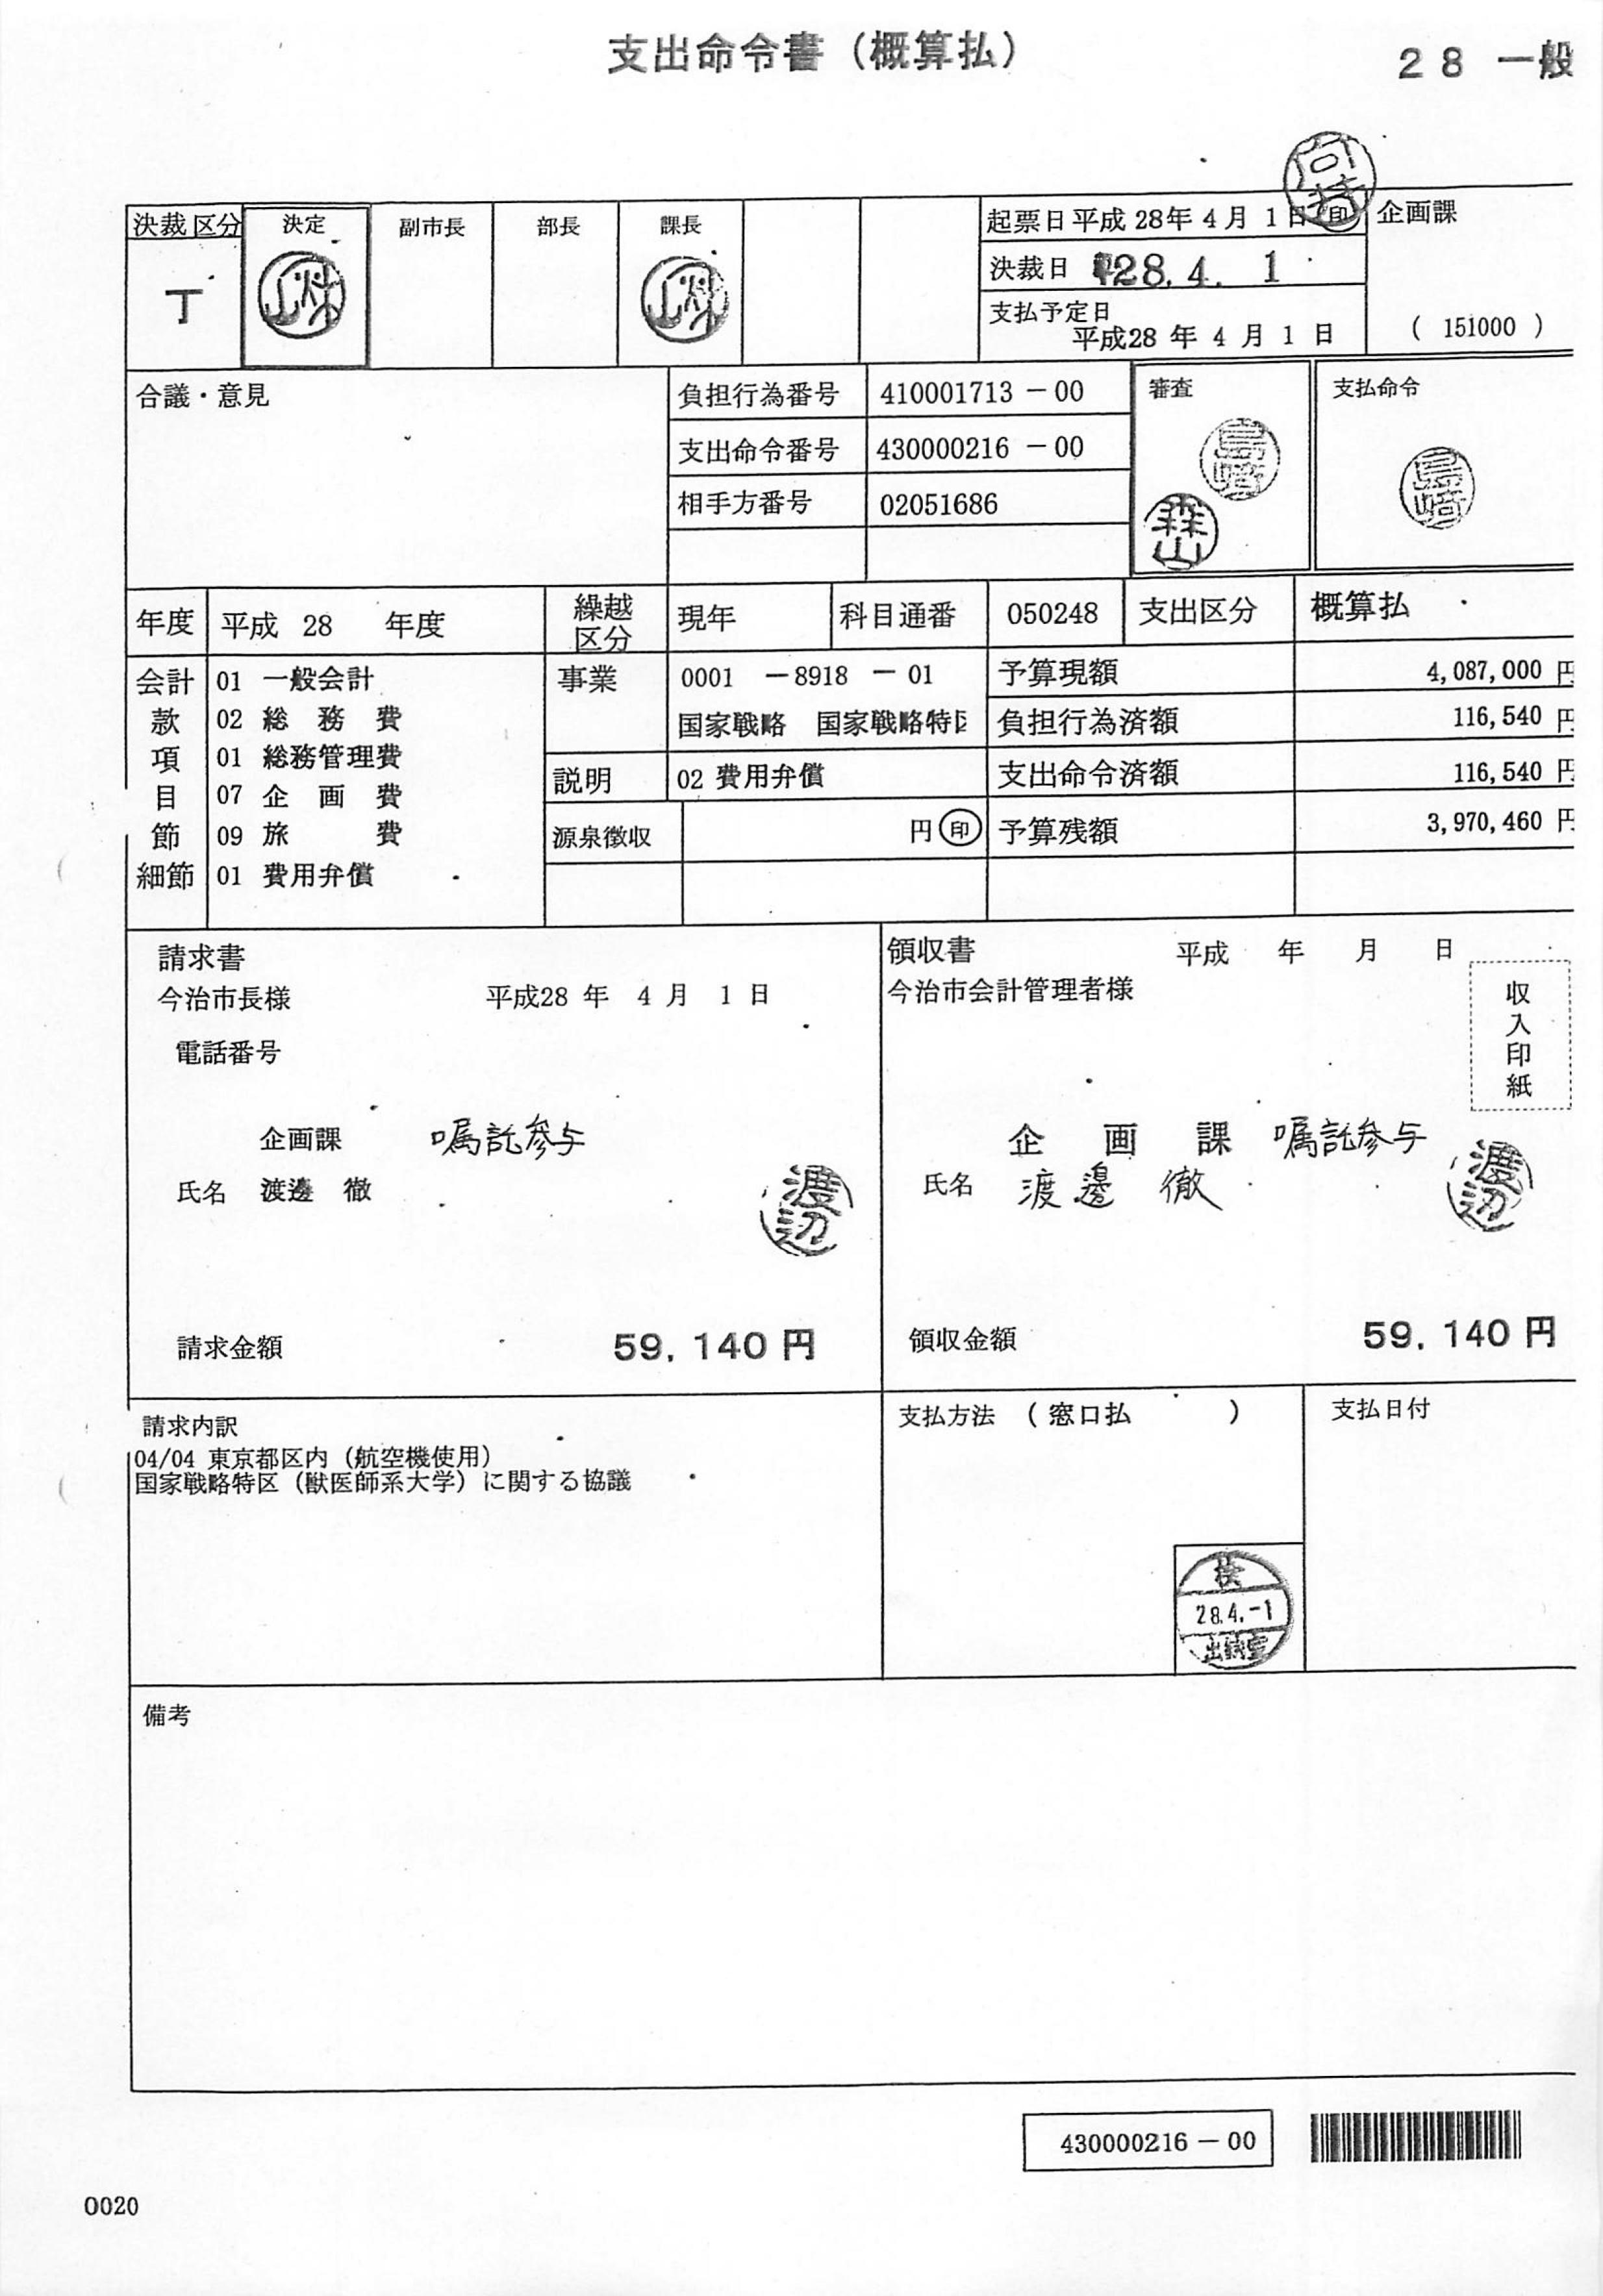 今治市 20160404東京出張 国家戦略特区(大学獣医学部の誘致等)に関する協議 (7)